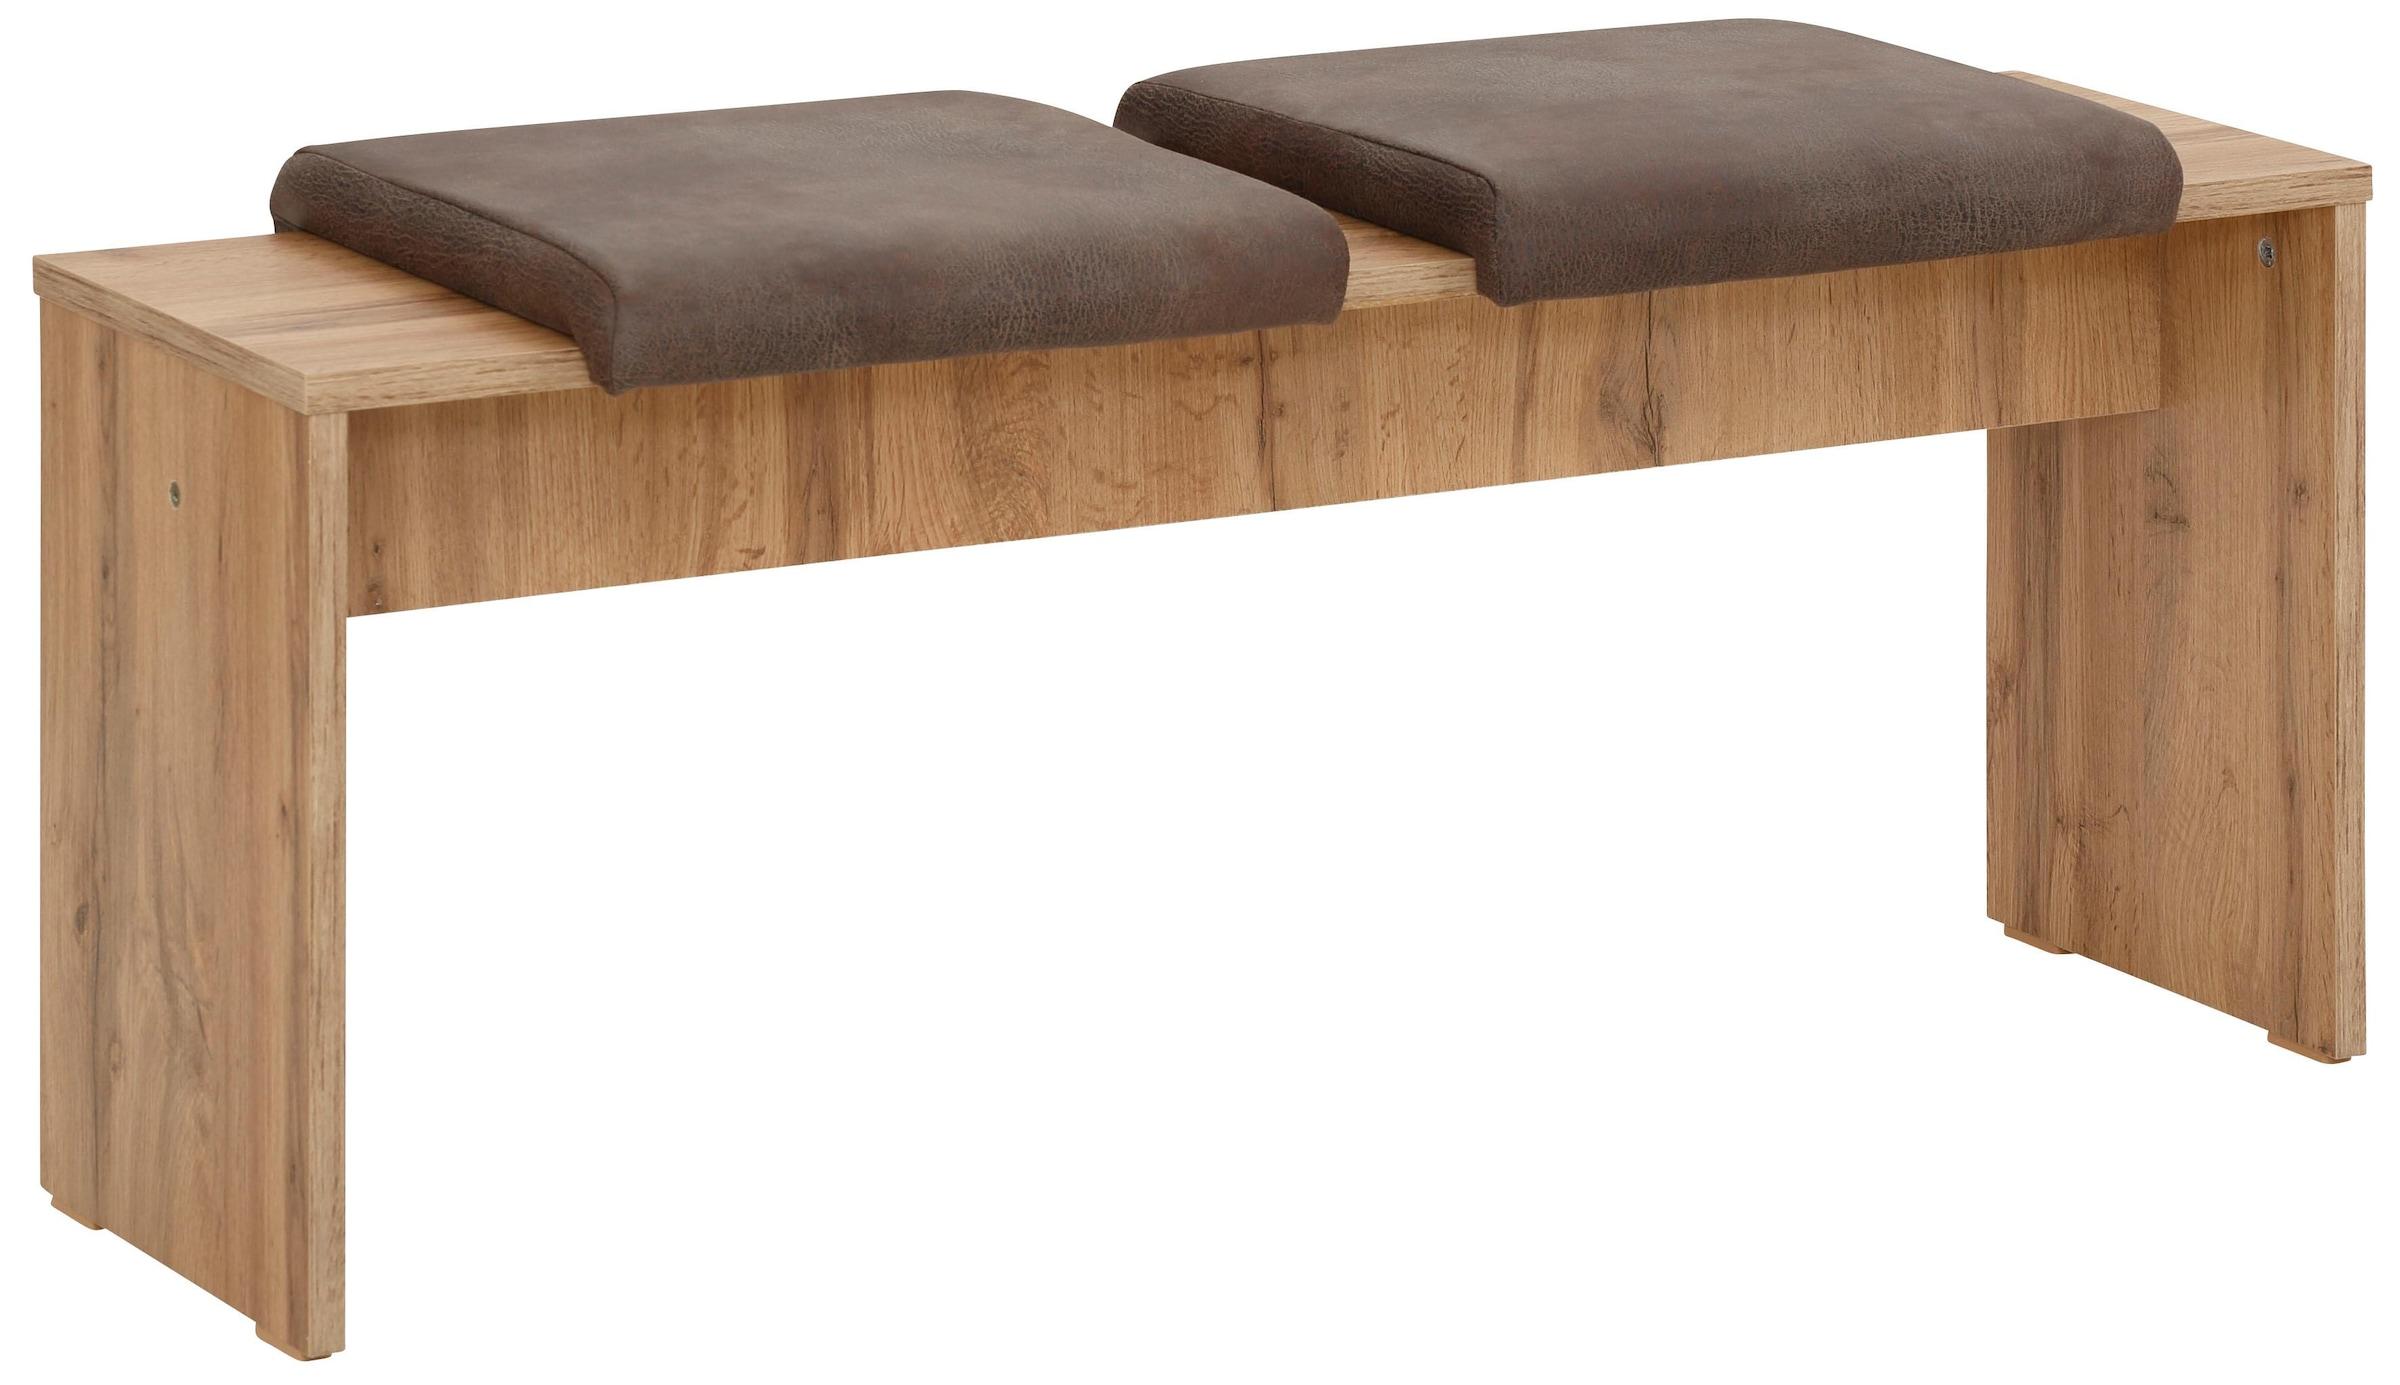 Sitzbank Sitzhocker Tulip Stoff Edelstahl gepolstert Größe /& Farbe wählbar